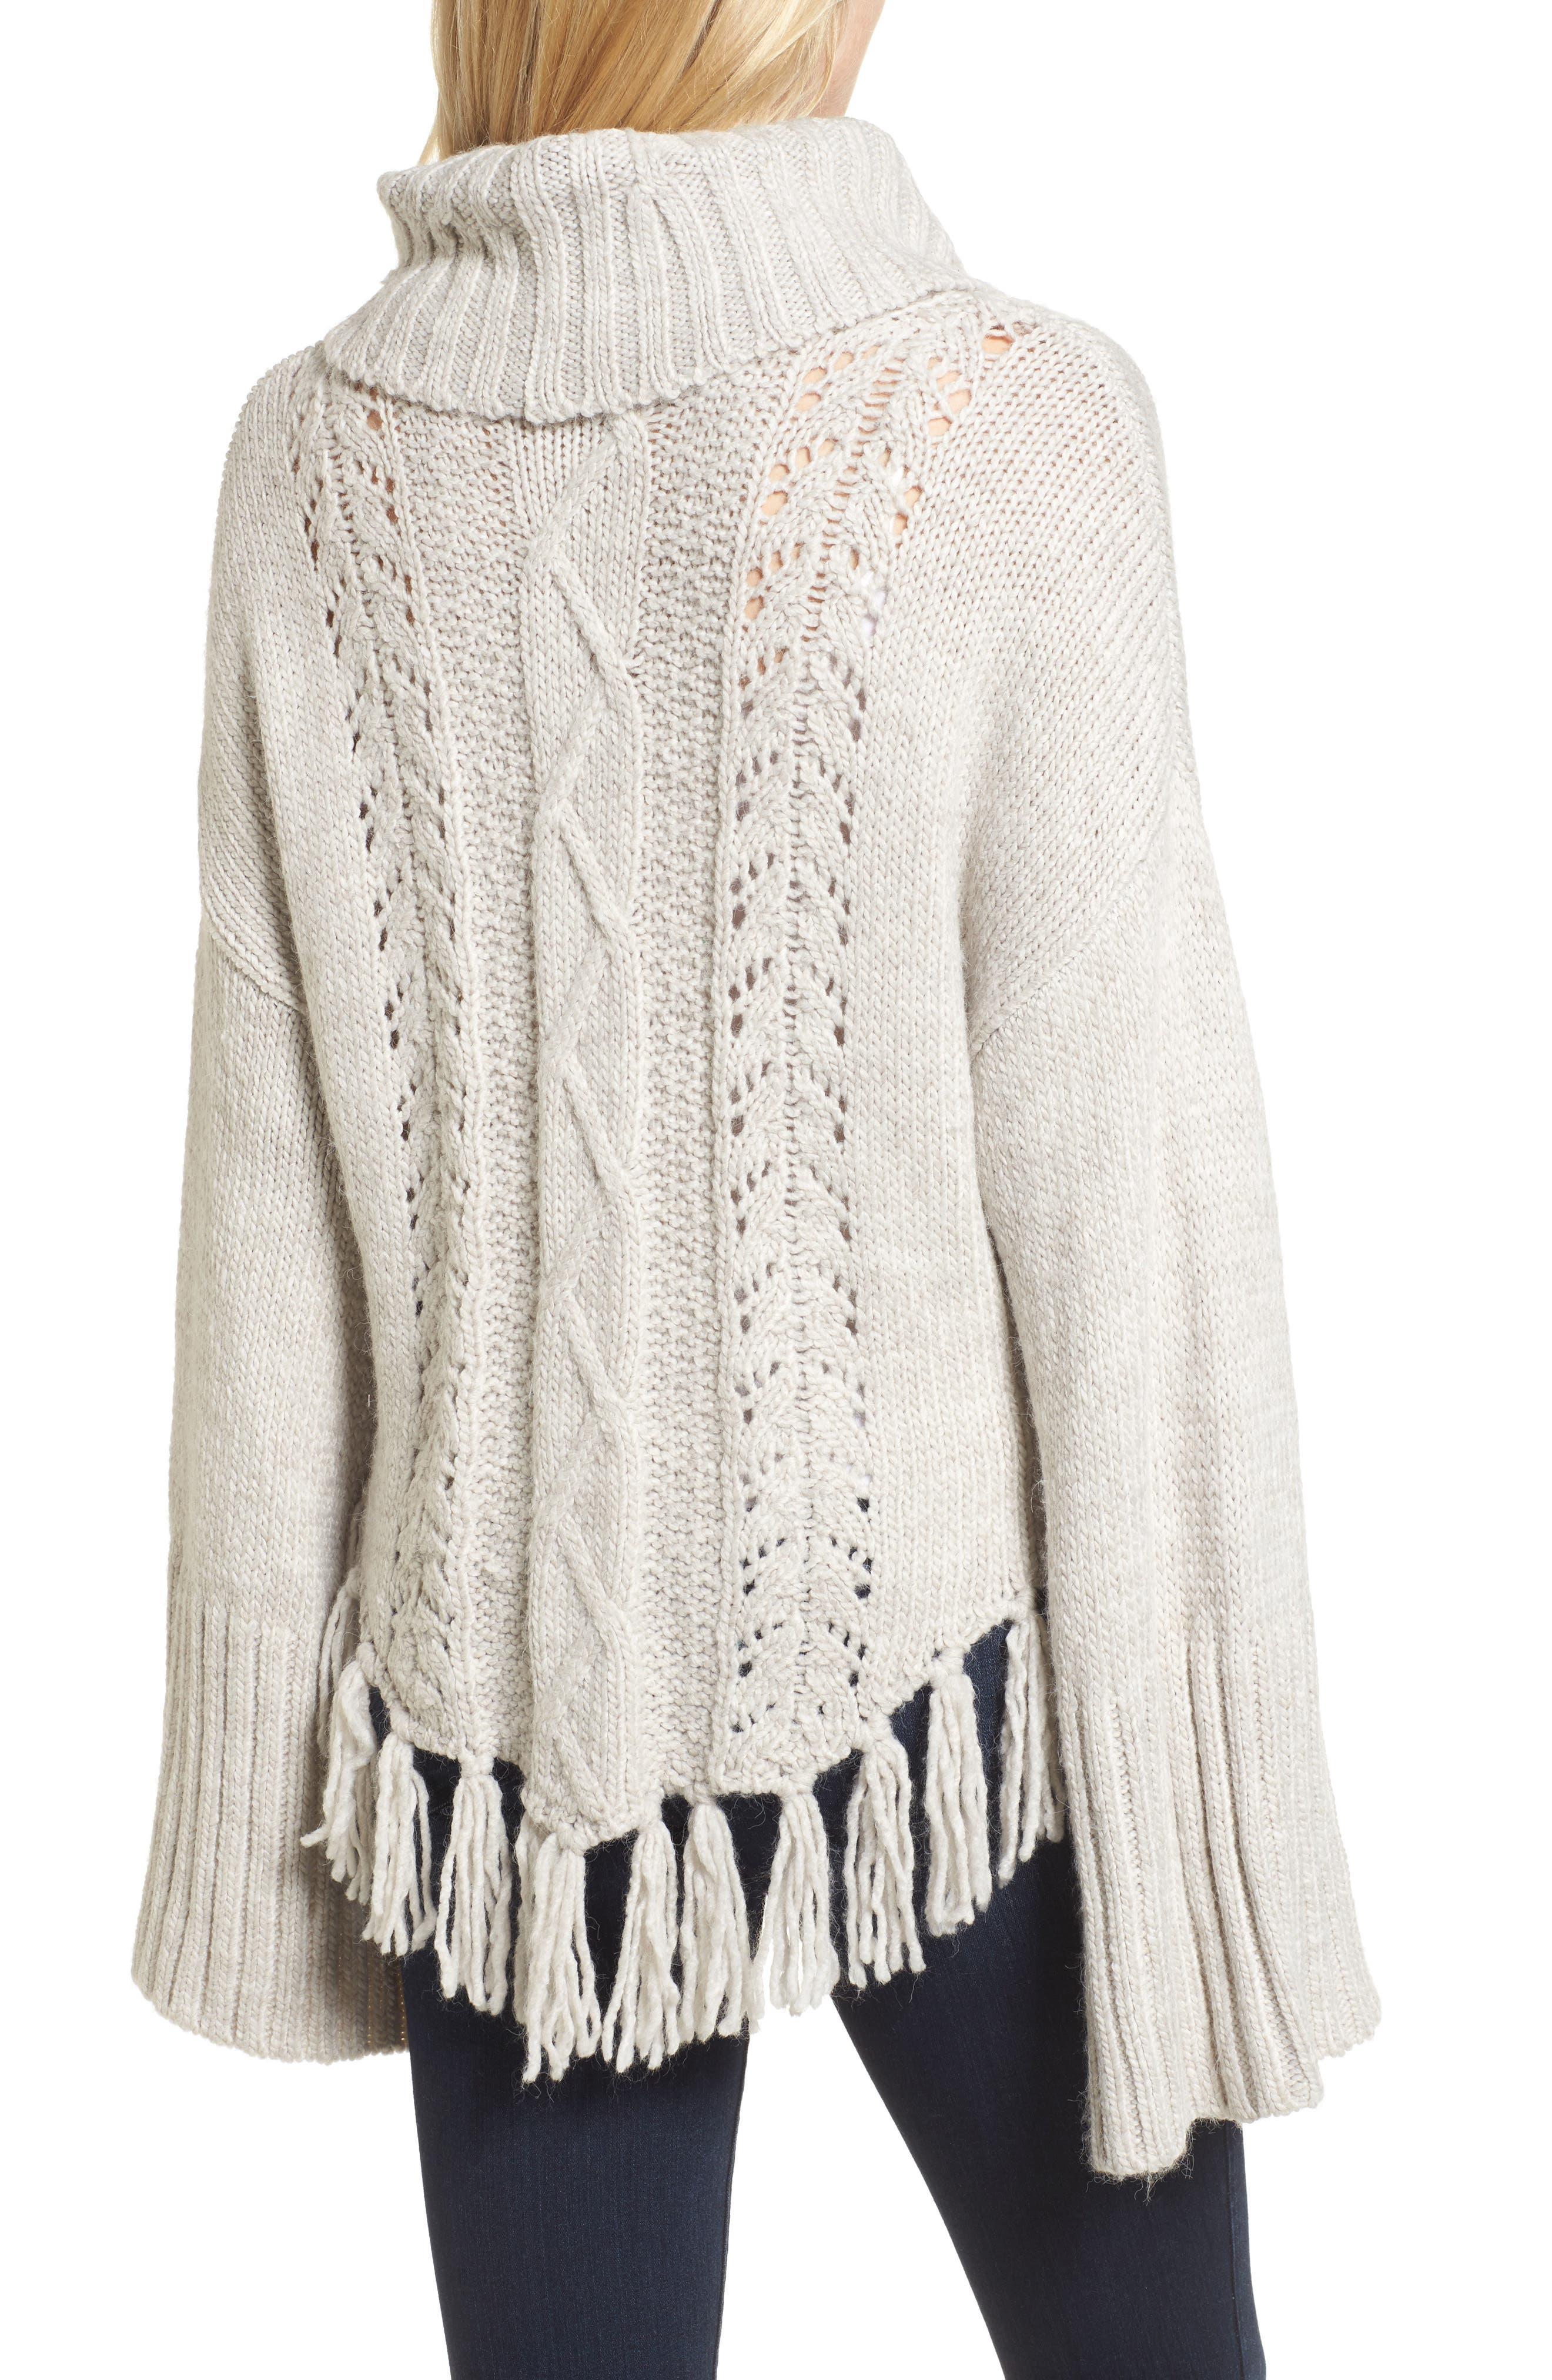 Prilla Fringe Cowl Neck Sweater,                             Alternate thumbnail 2, color,